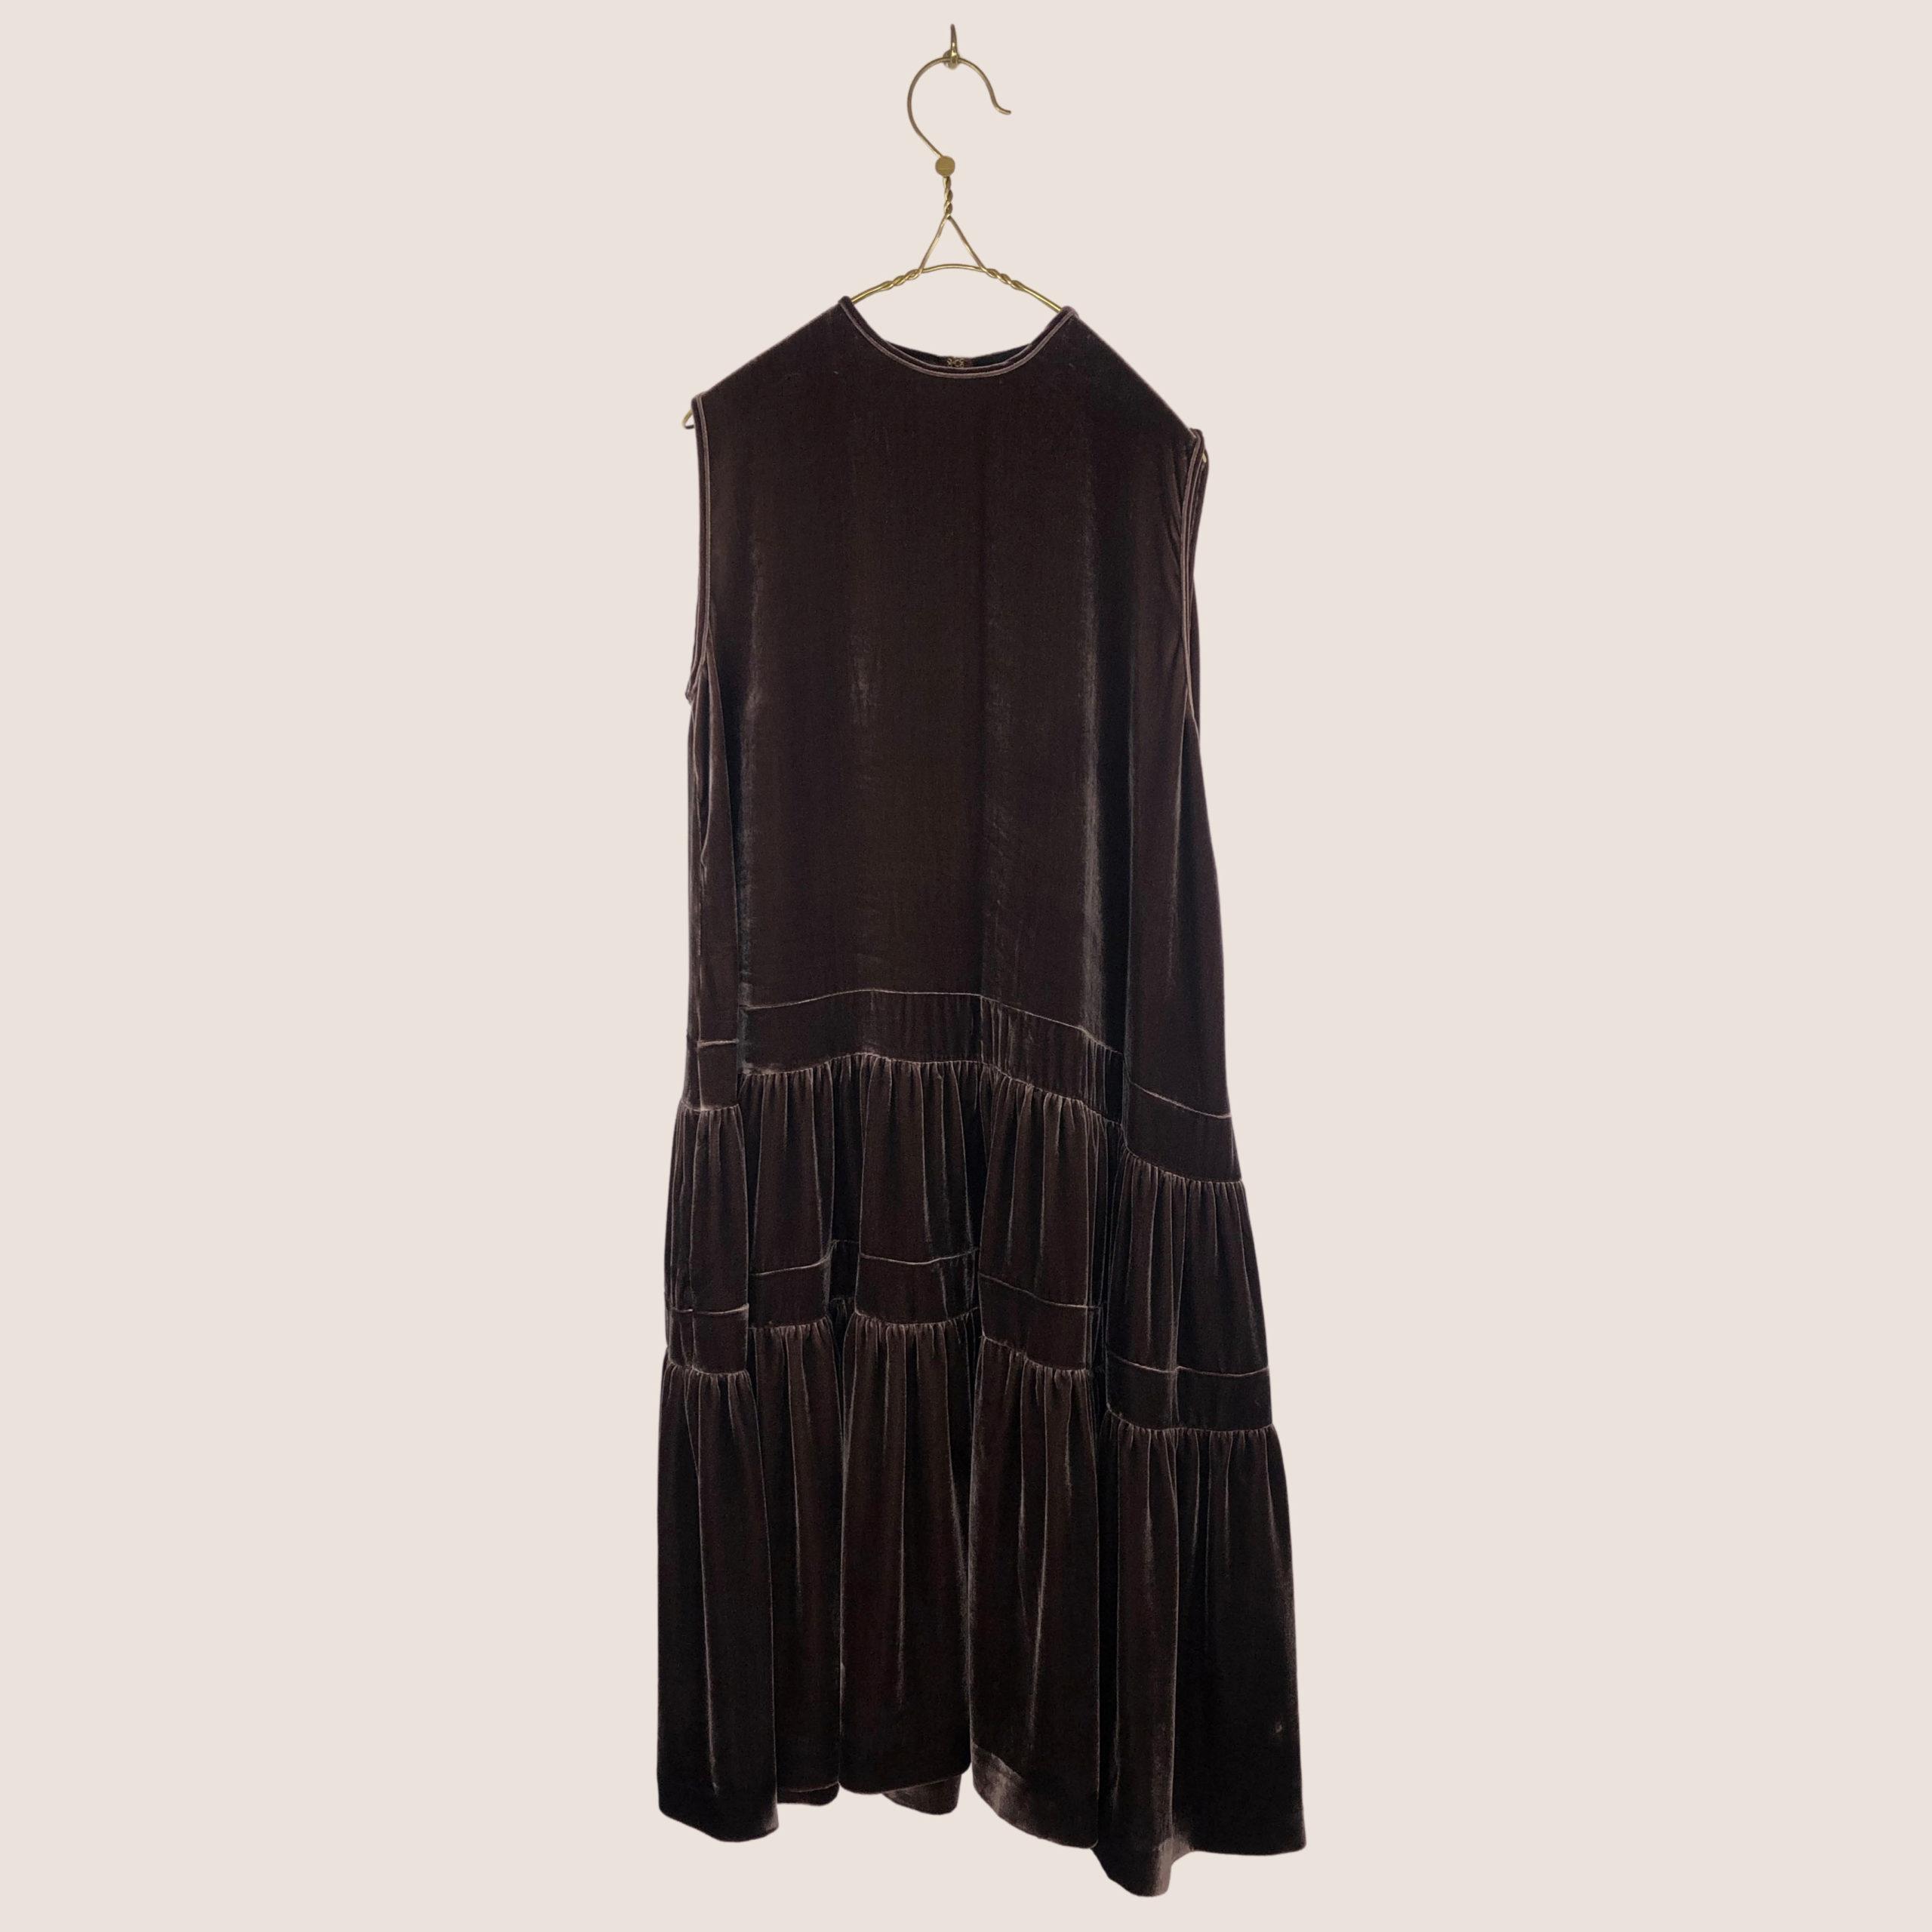 Rouleau Dress